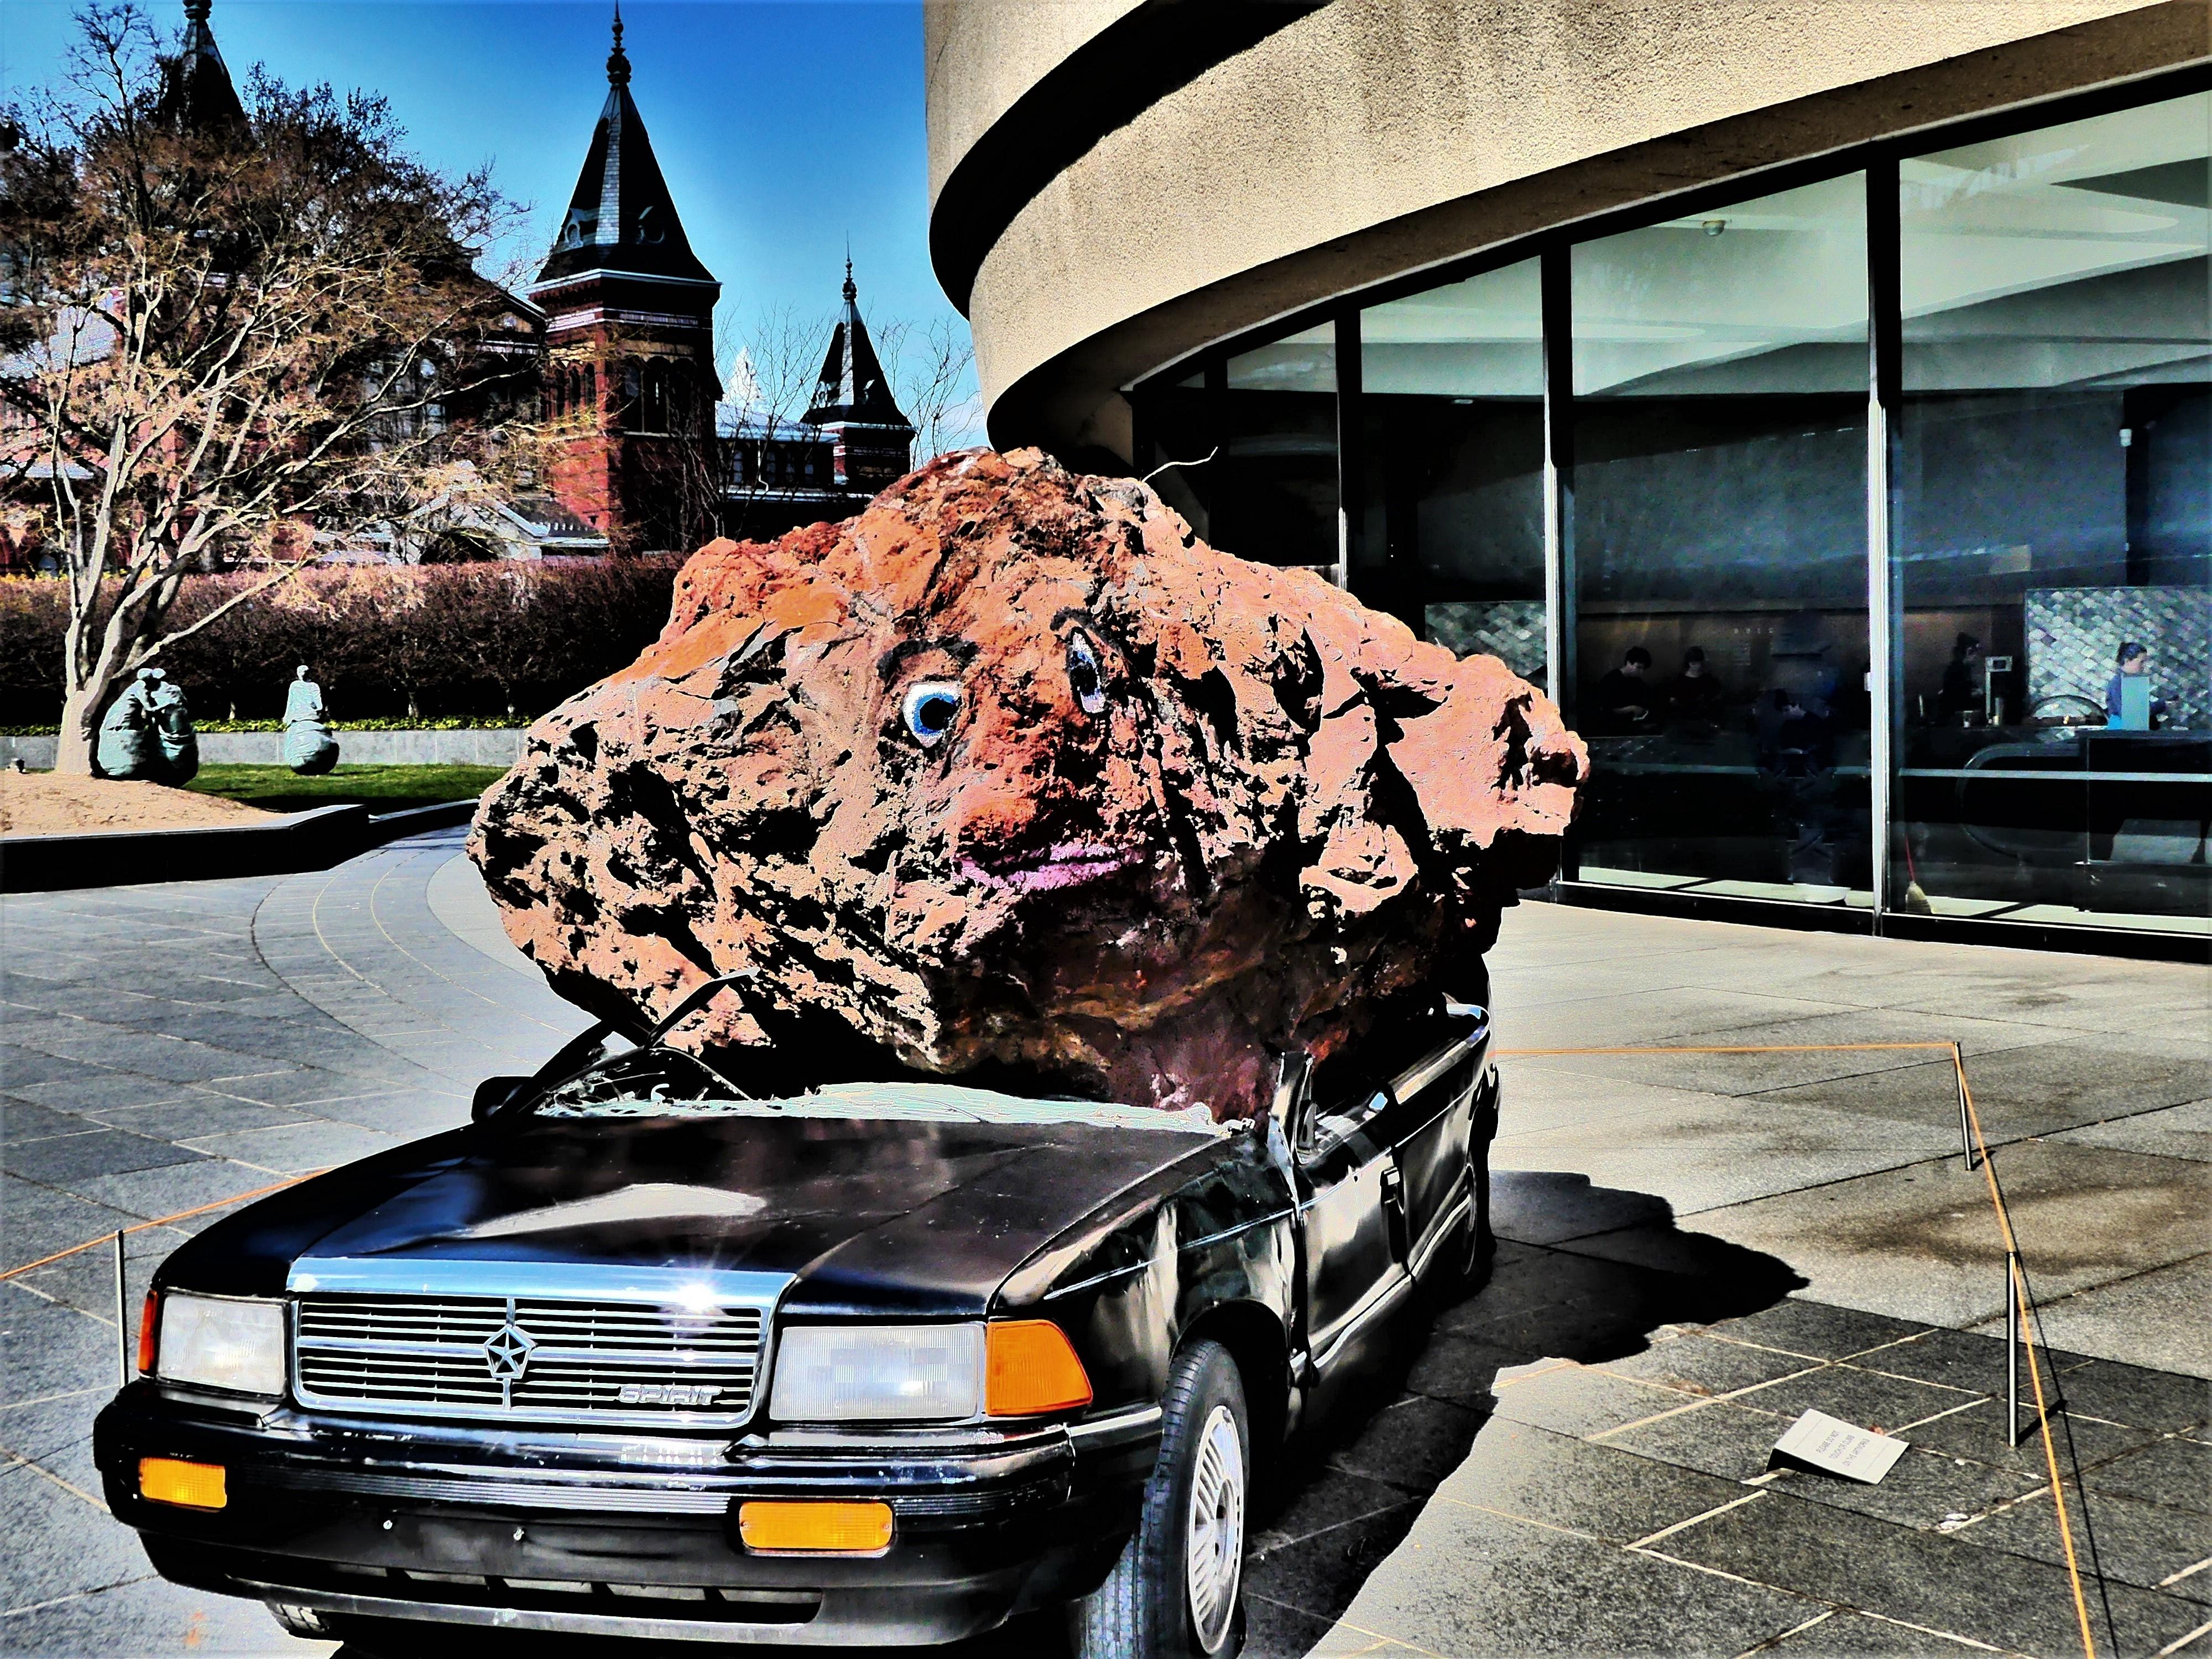 rockface and car